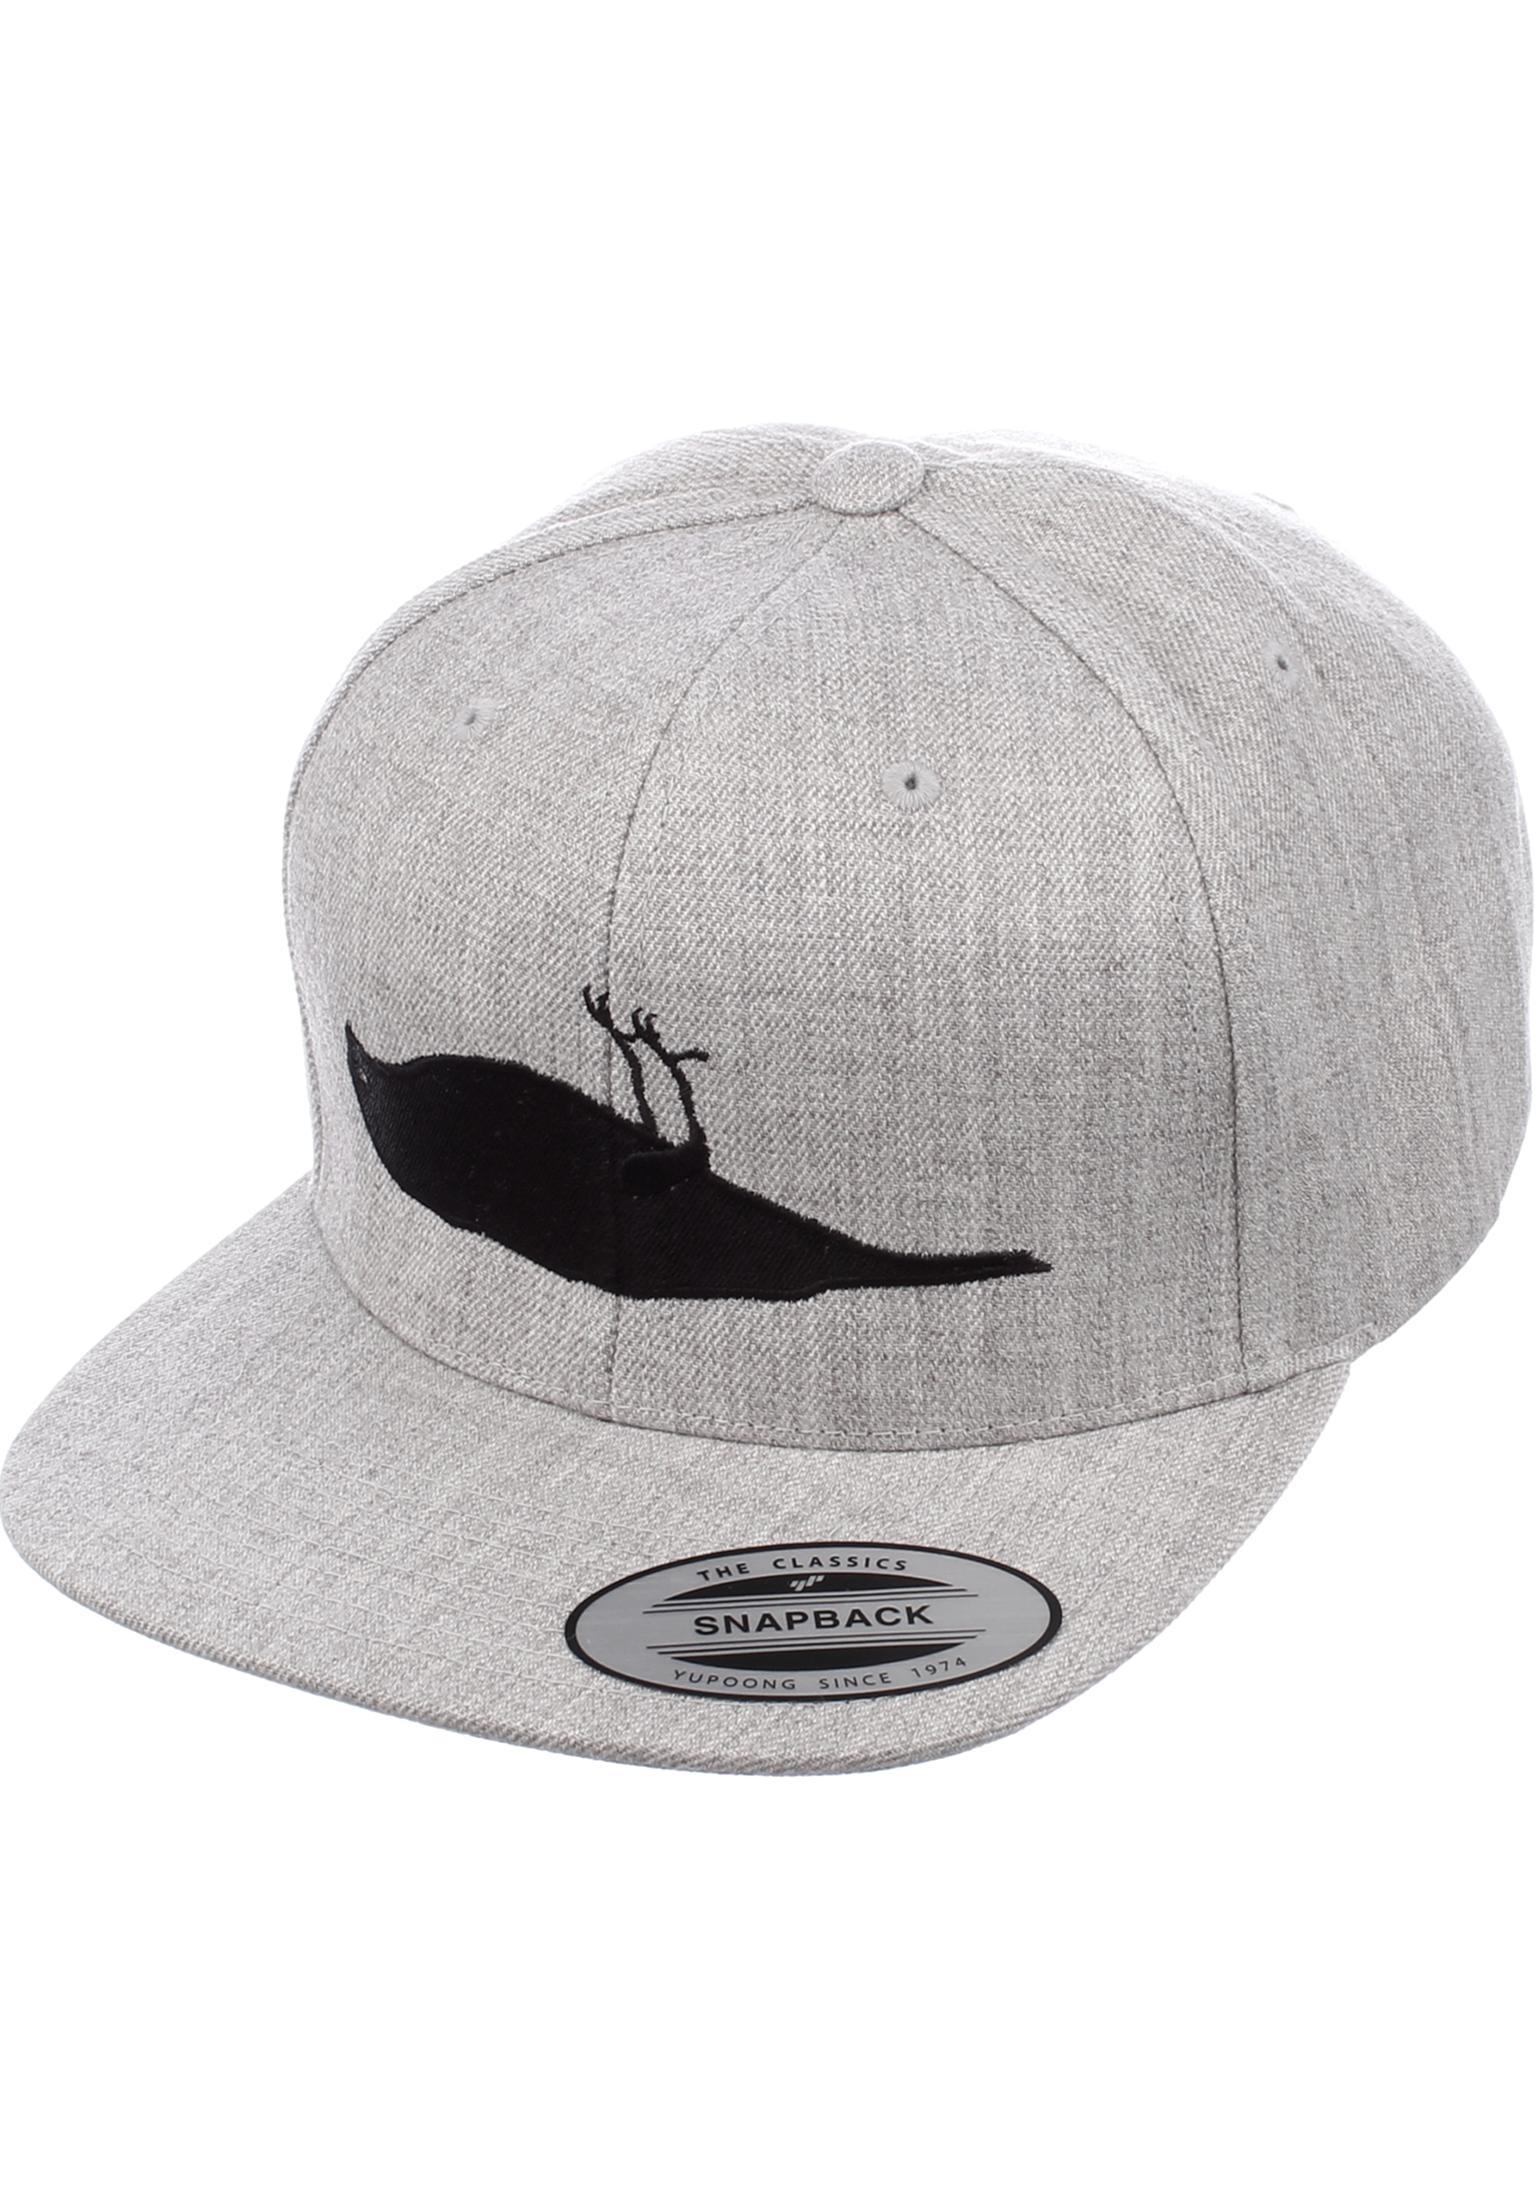 Solid Bird Atticus Caps in heathergrey for Men  dfd8dd14f0